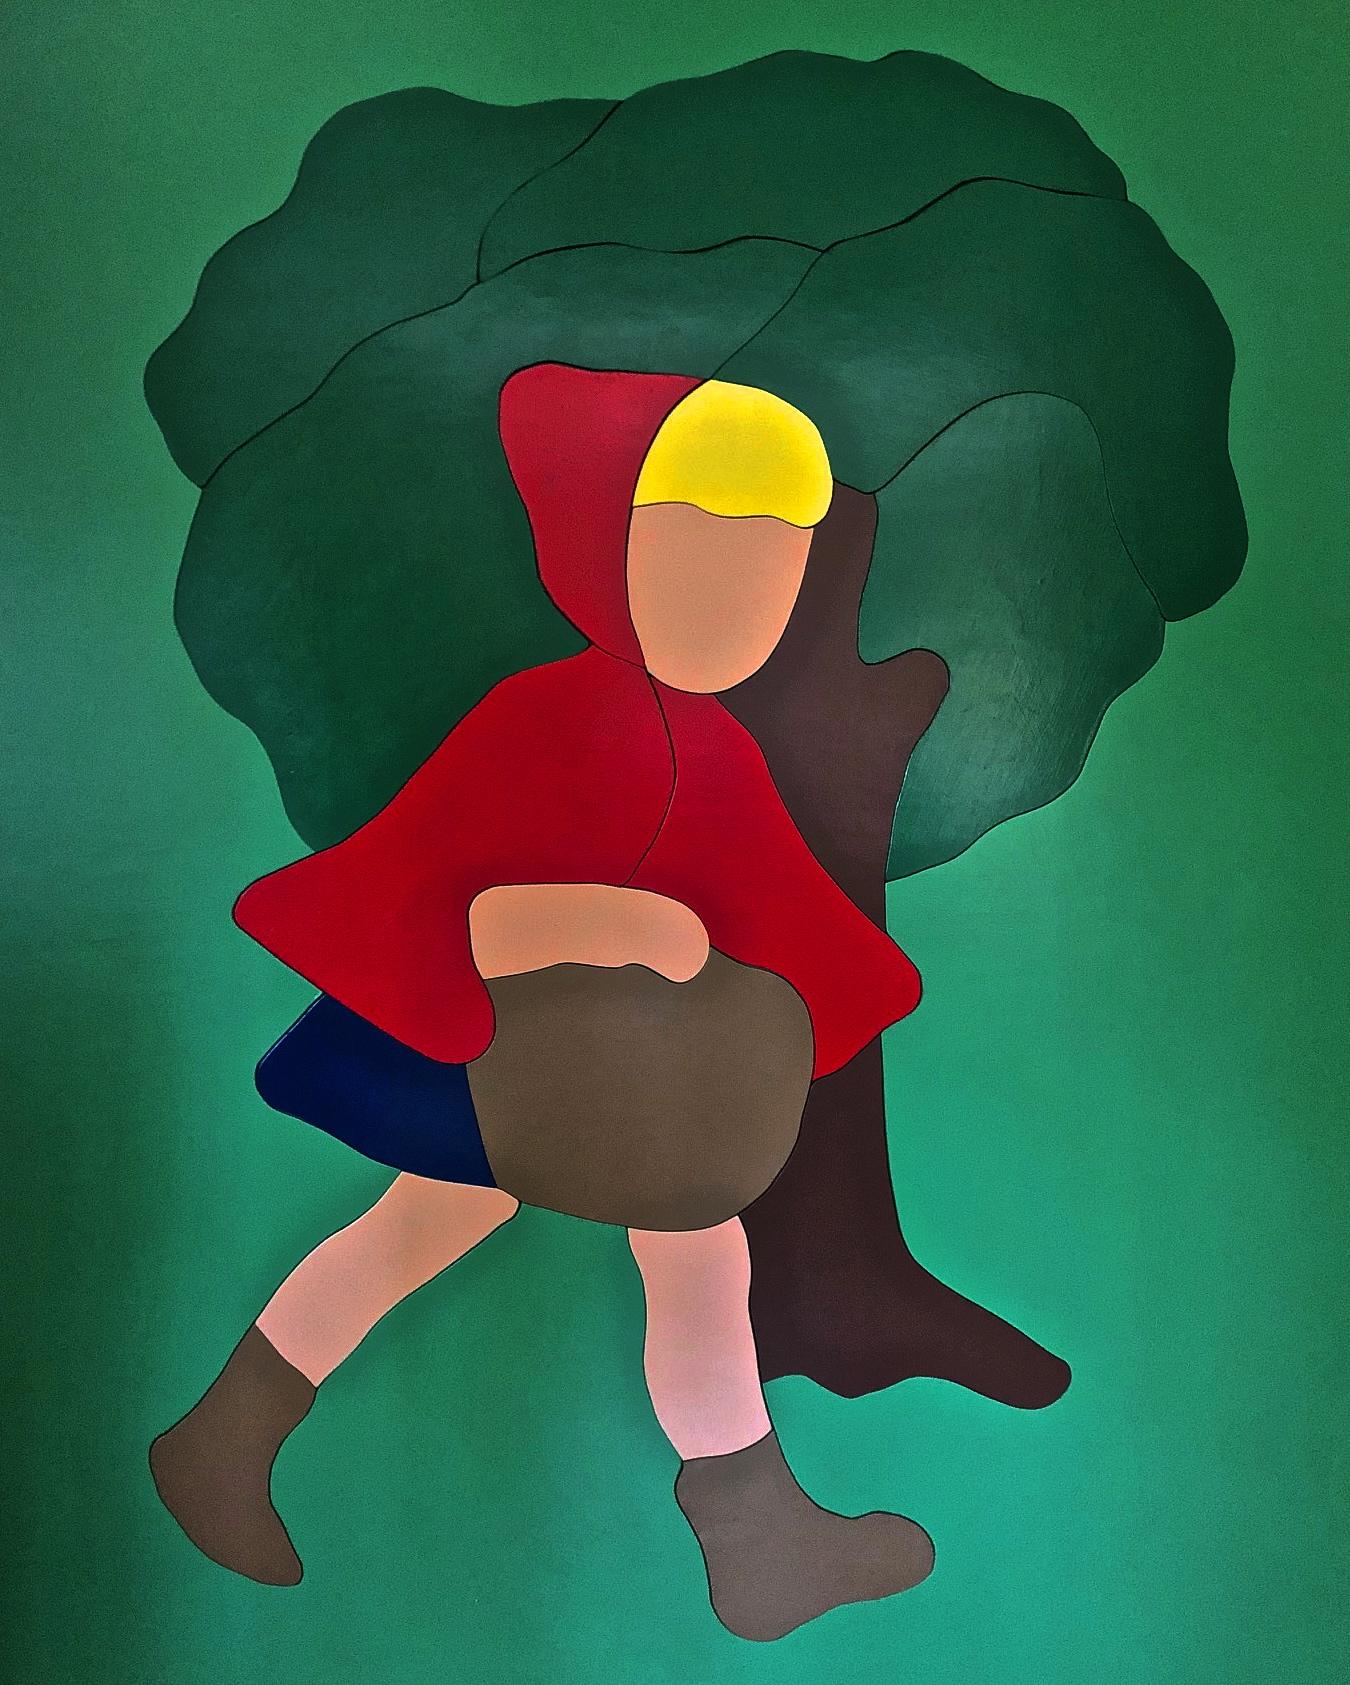 Little Red - Michael Larry Simpson - Latex paint on cut wood pieces - 61_ X 49_ - 2018 - $3,200.jpg